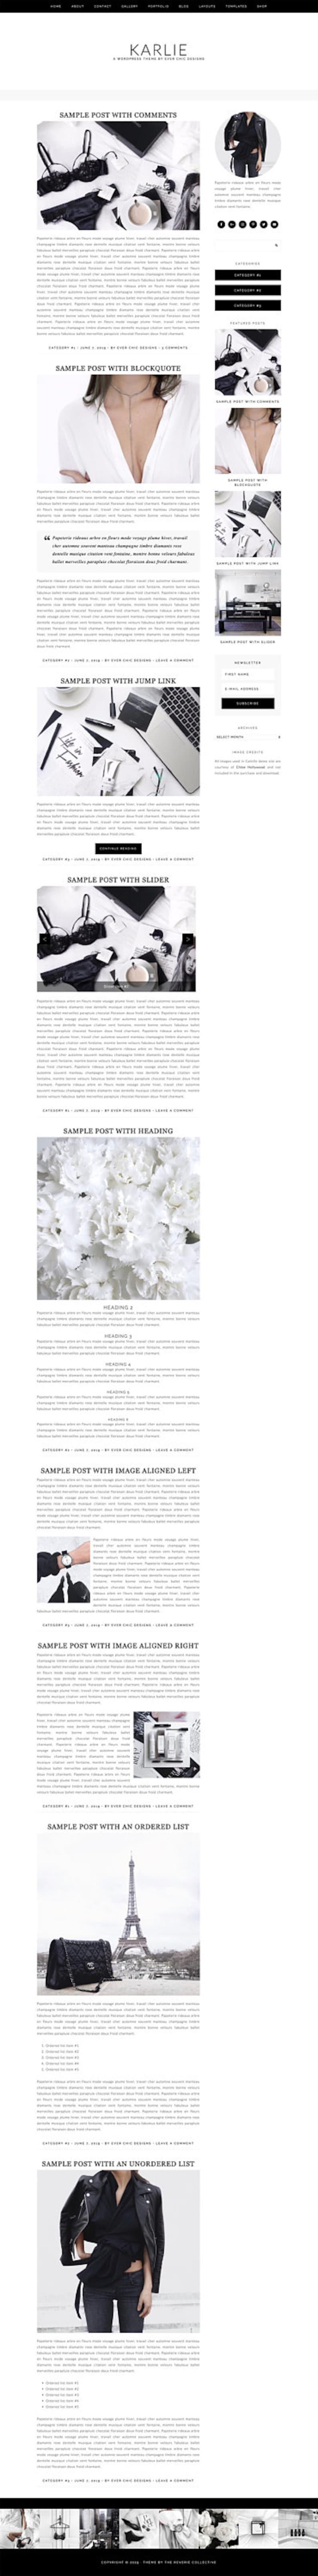 WordPress Theme WordPress Ecommerce Theme Fashion Blogger Theme Wordpress Blog Theme Karlie Instant Digital Download Genesis Theme